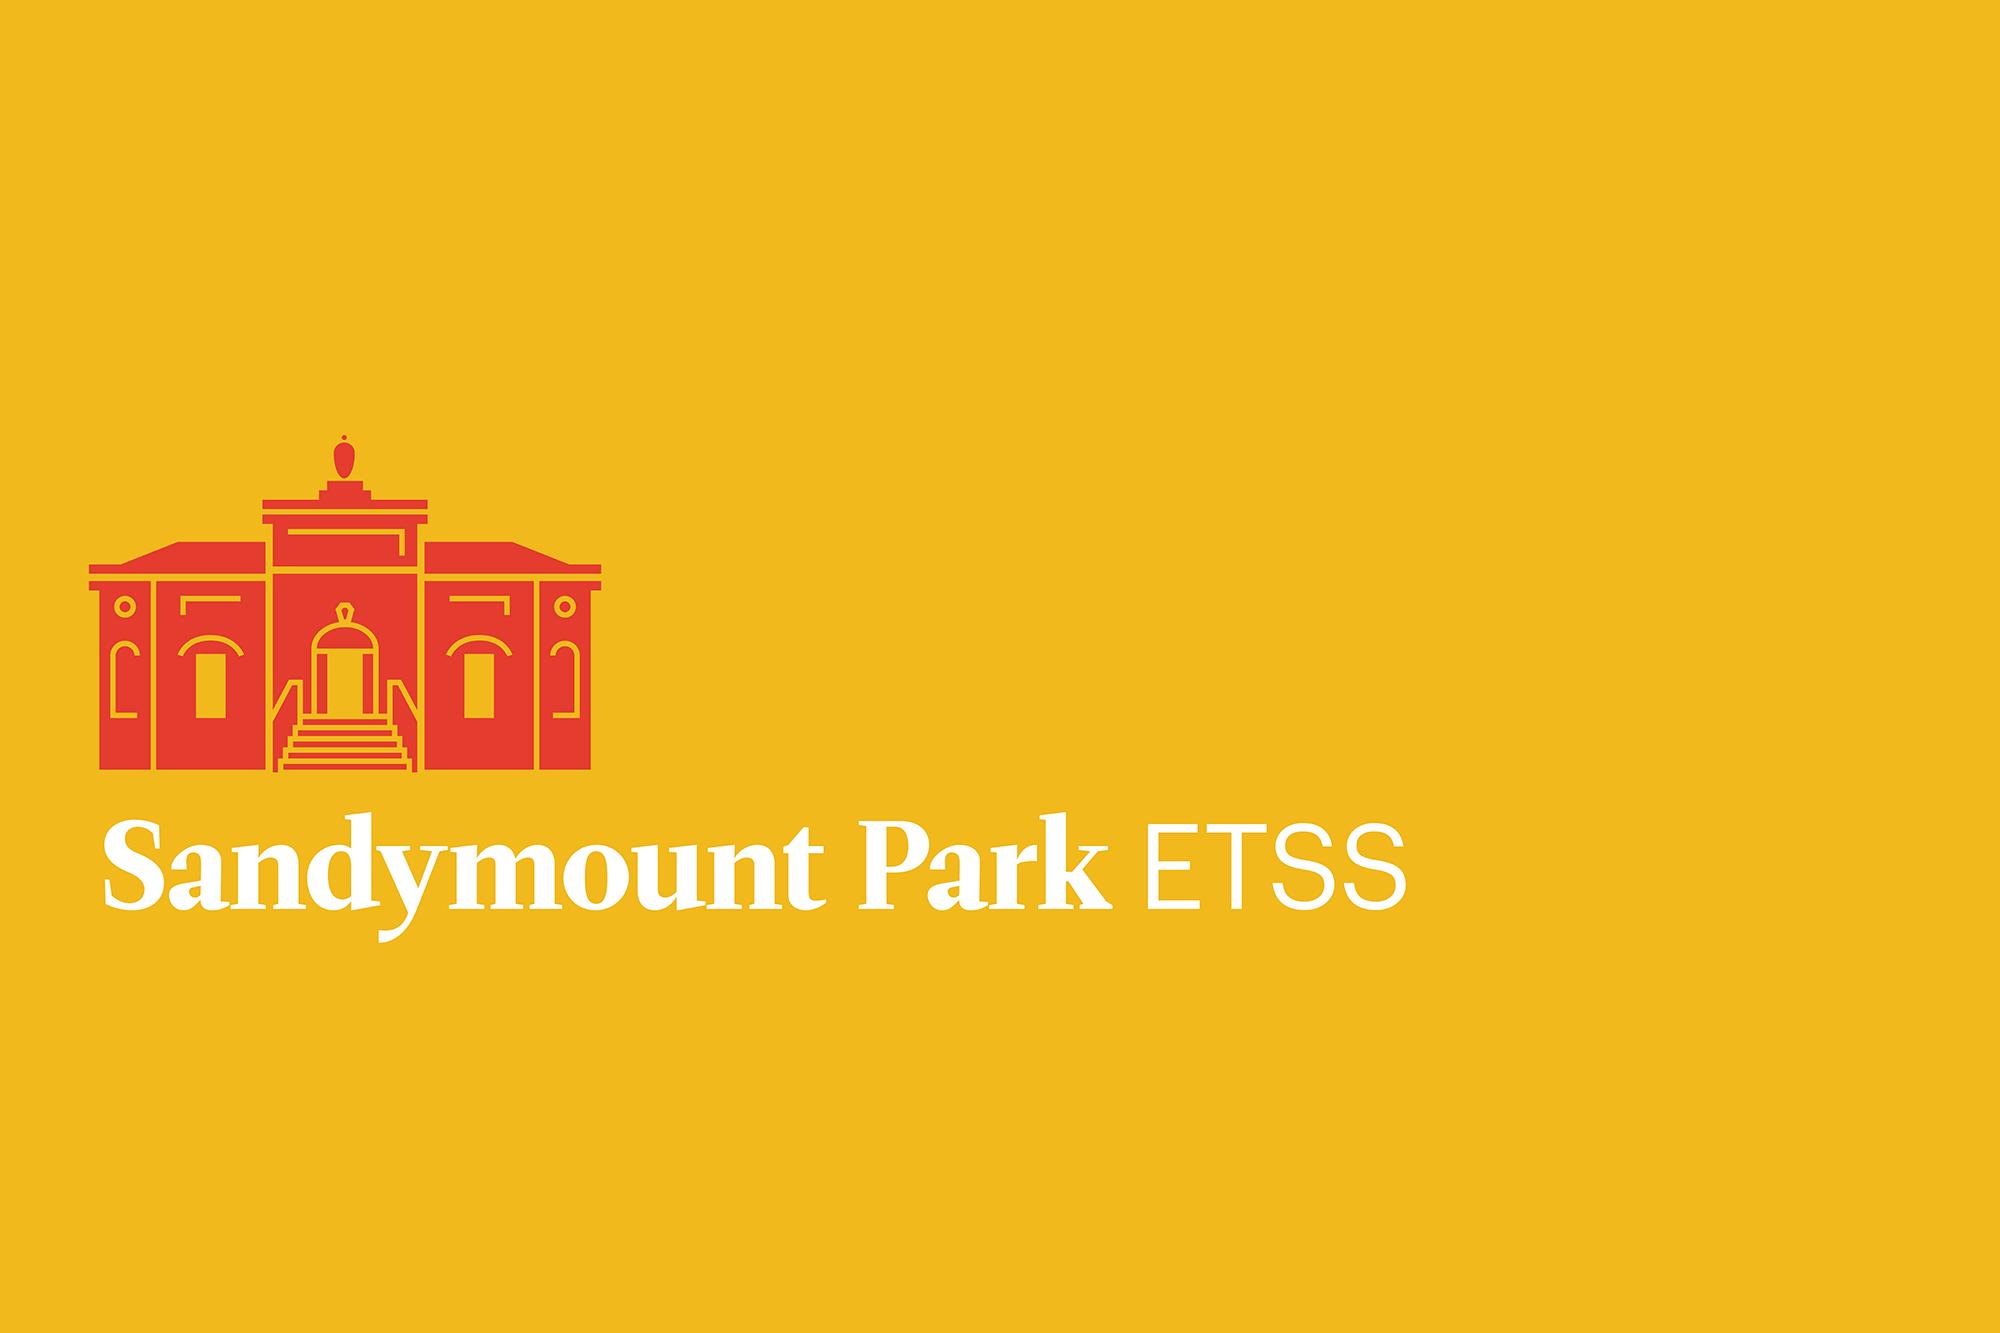 Cover image: Sandymount Park Identity